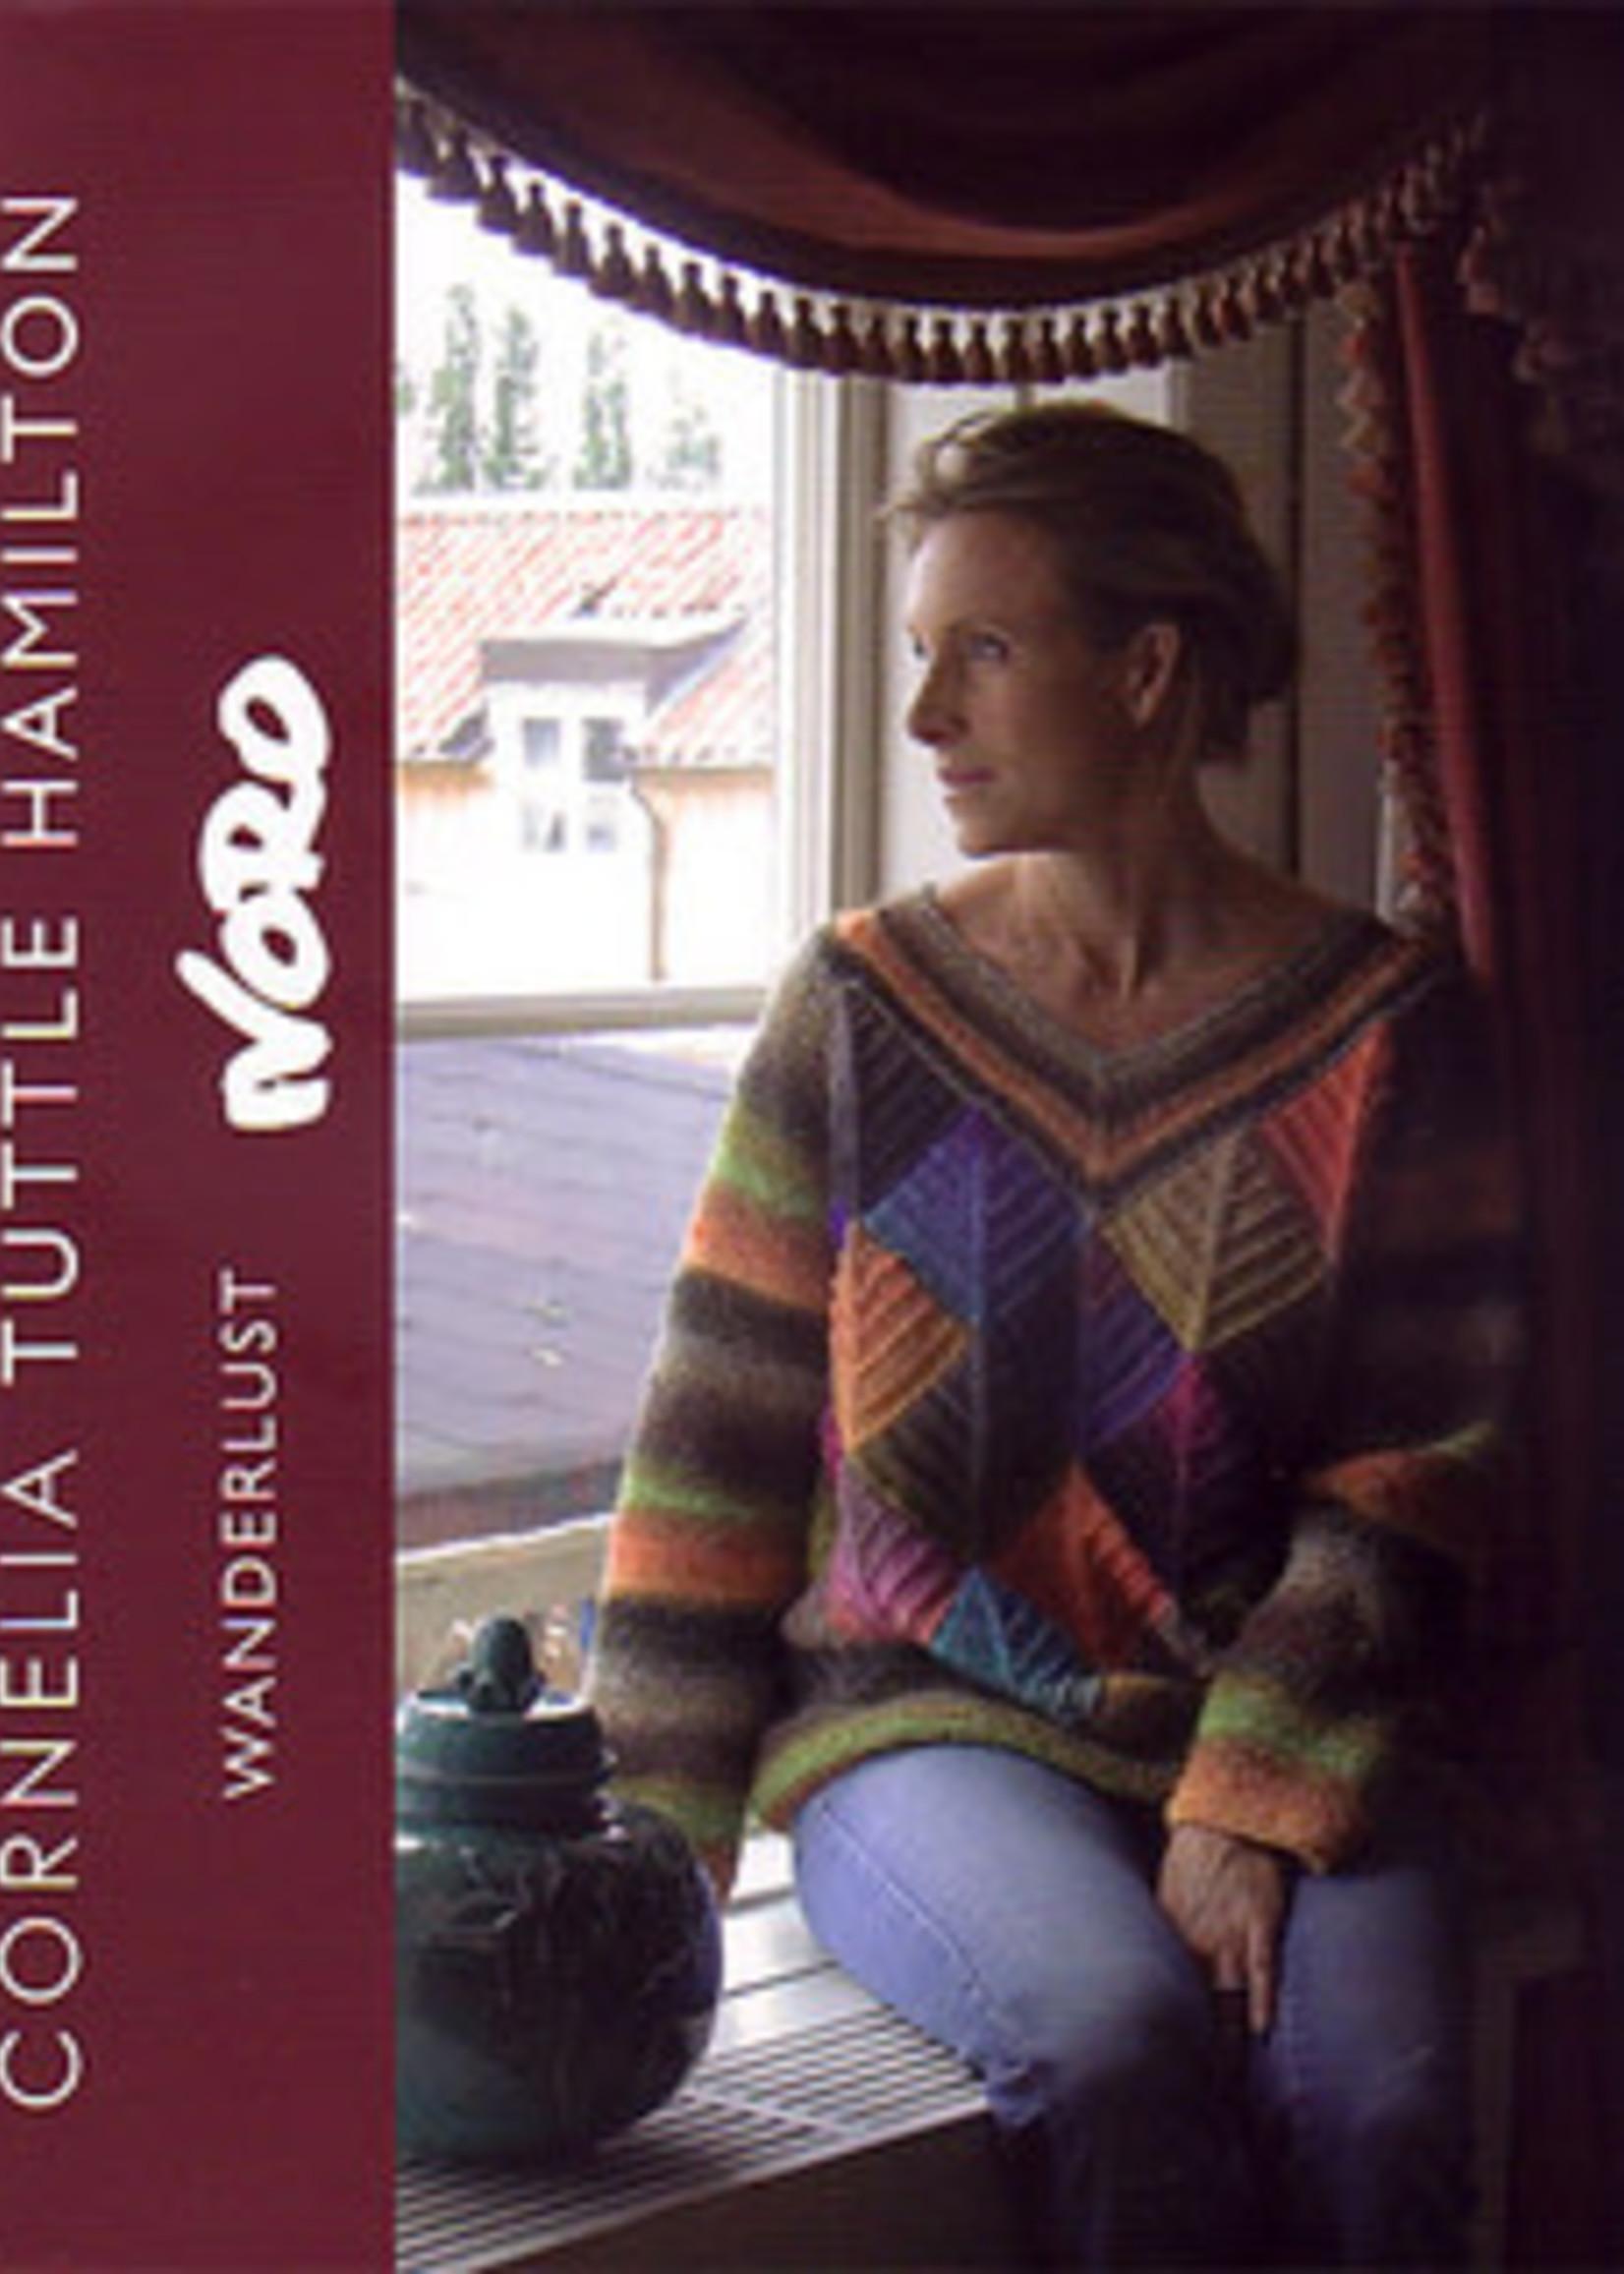 Noro Pattern Books Wanderlust by Cornelia Hamilton